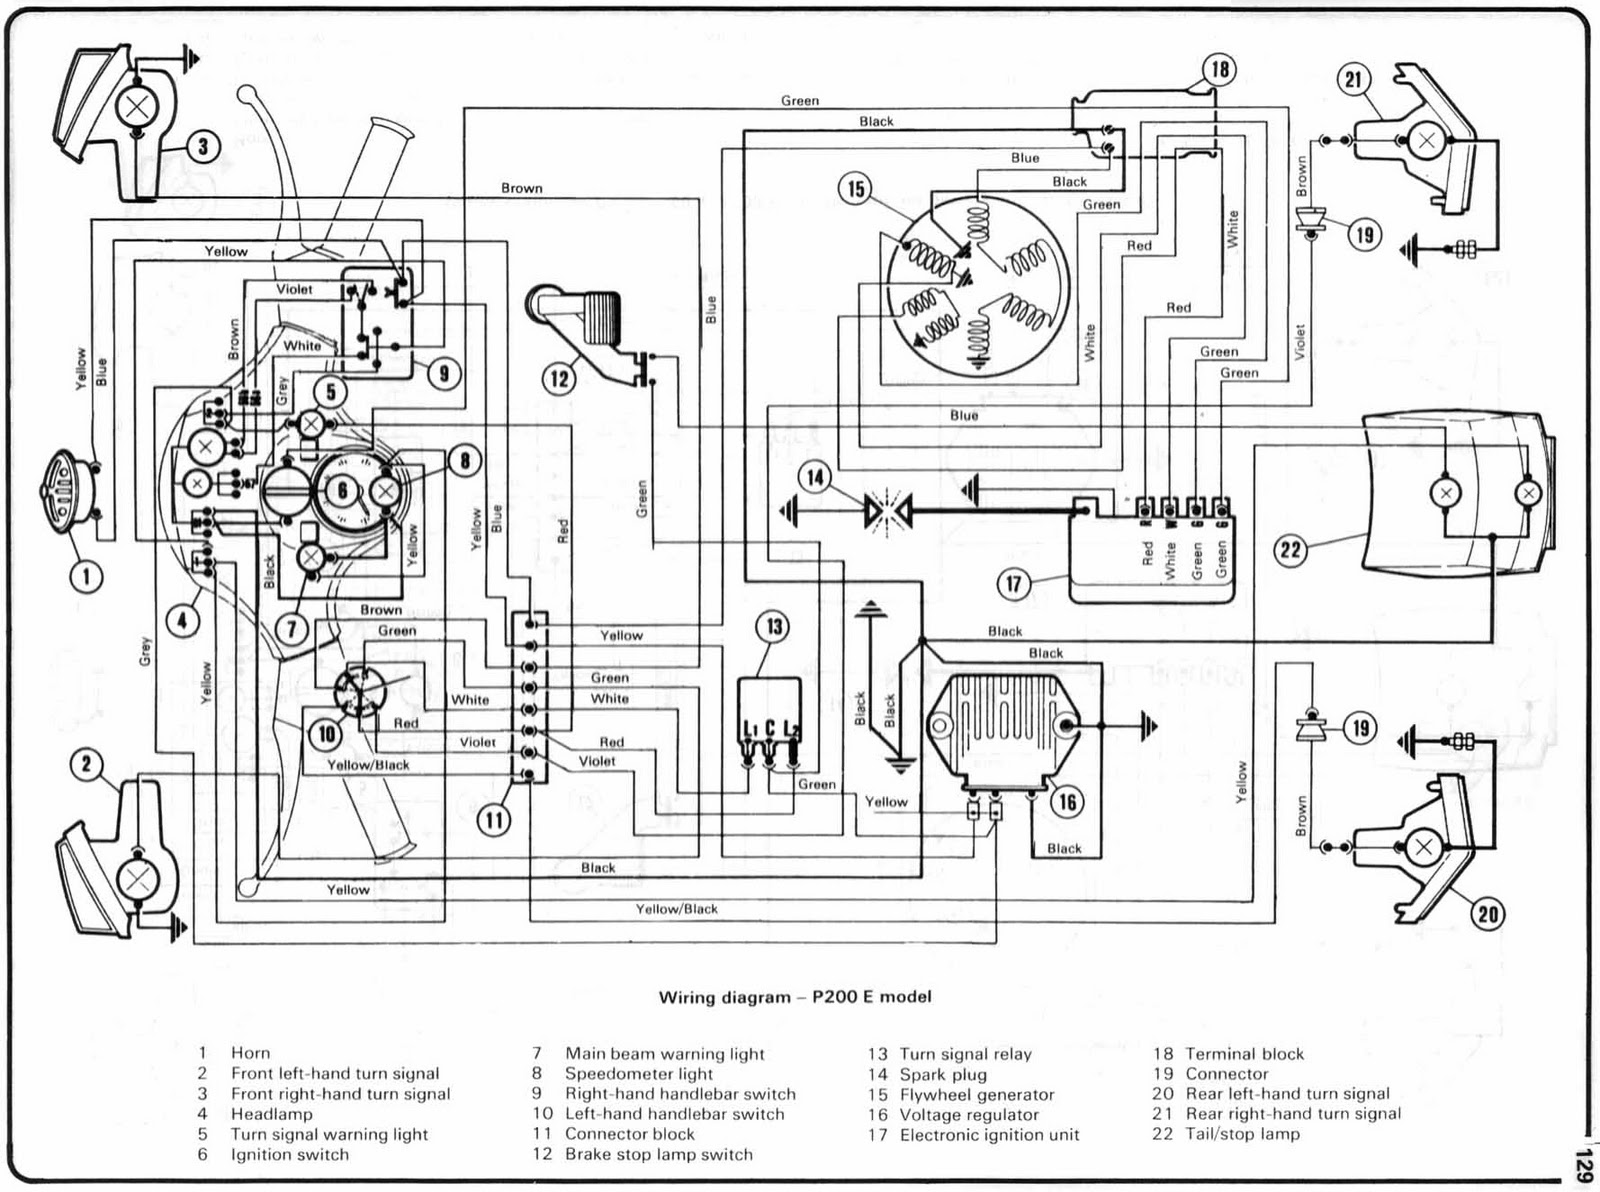 Wiring Diagrams 911: Vespa P200 E Model Wiring Diagram